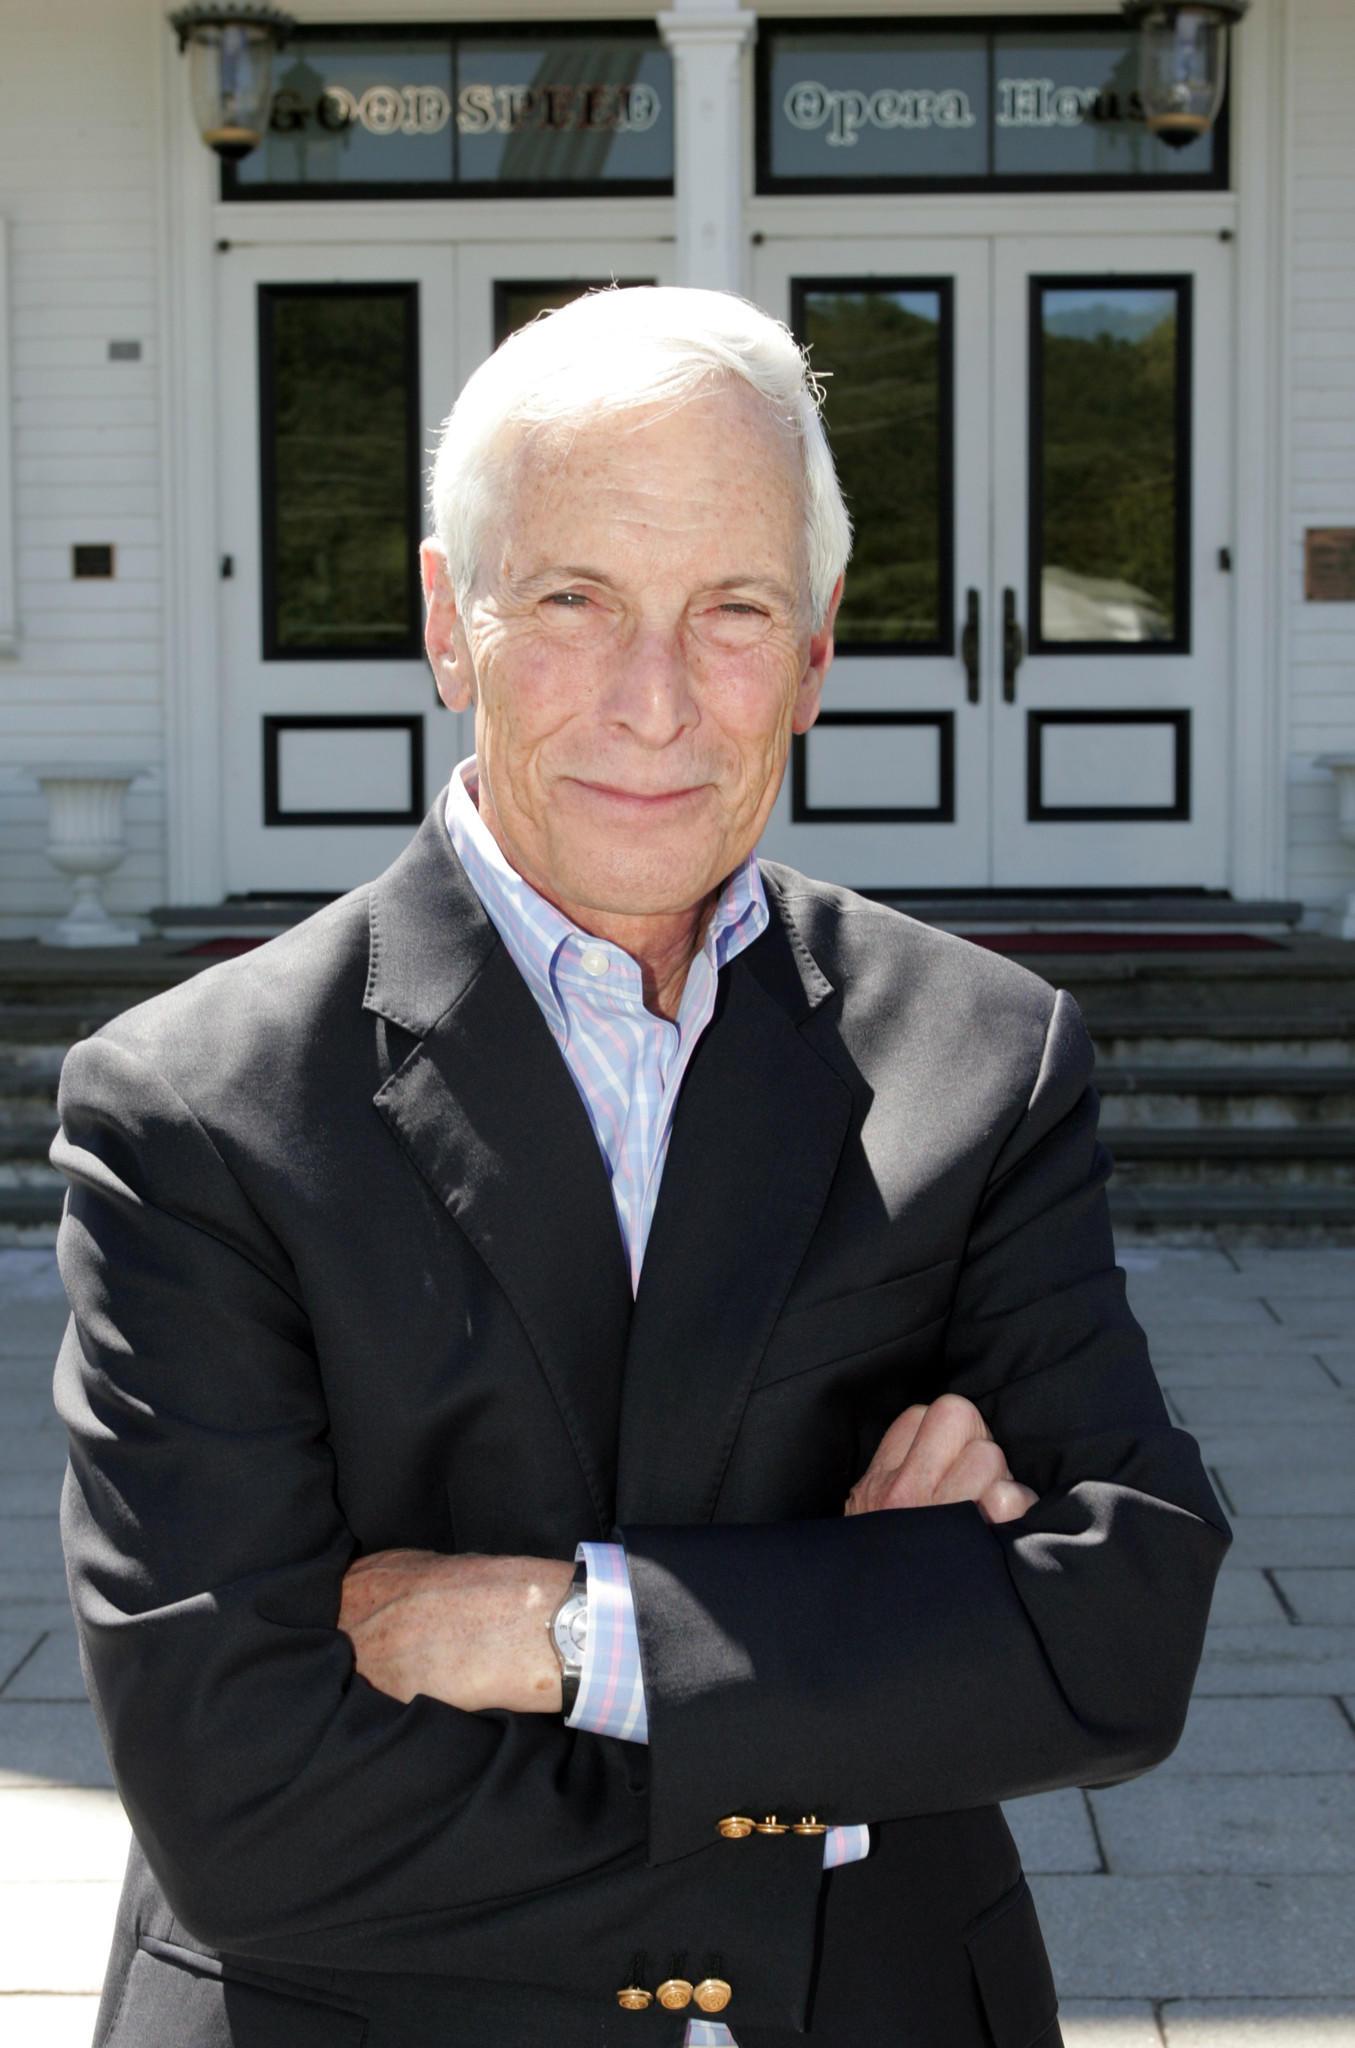 Michael P. Price, Executive Director, Goodspeed Musicals